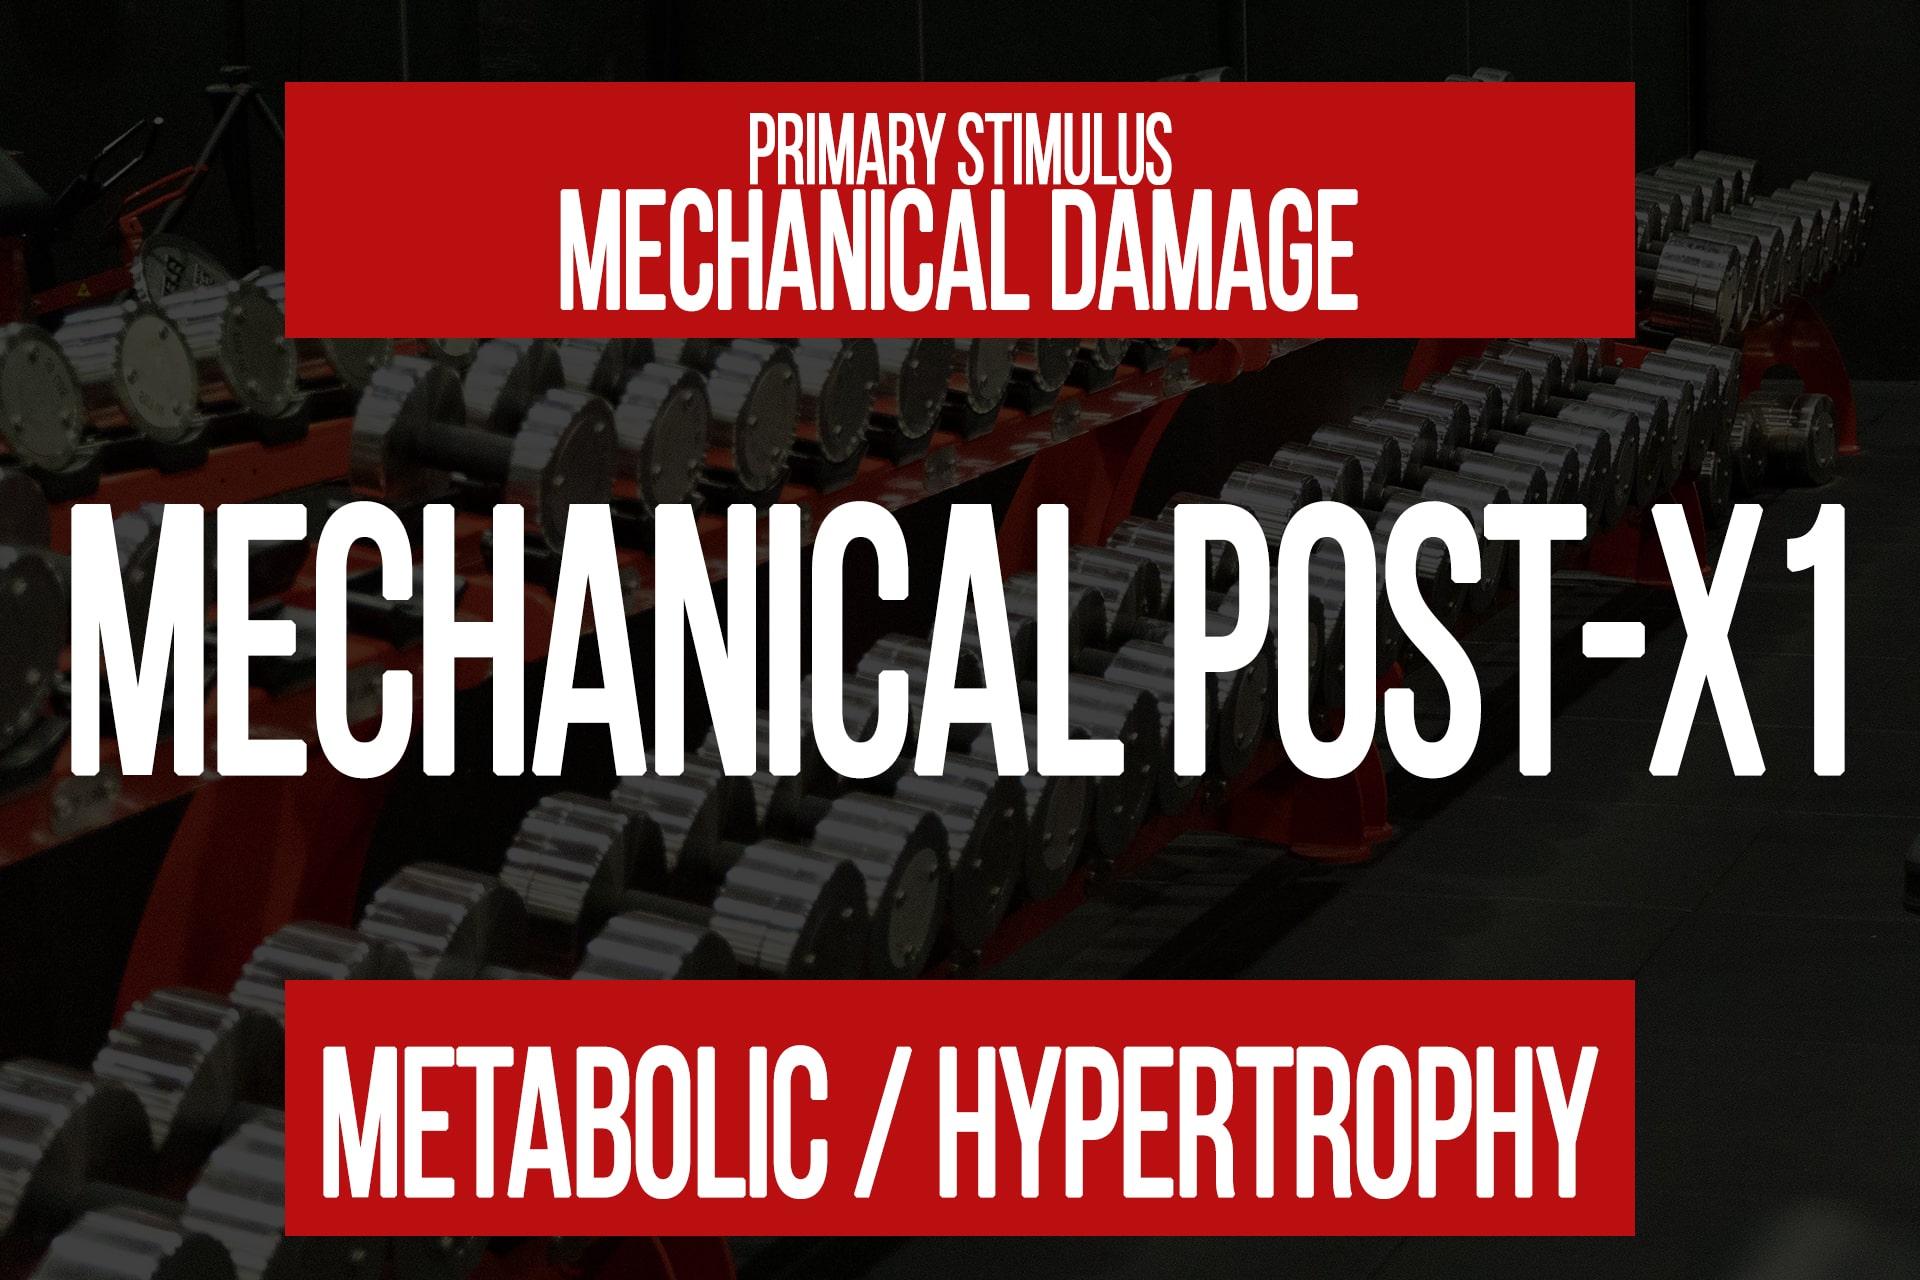 Mechanical Post-X1